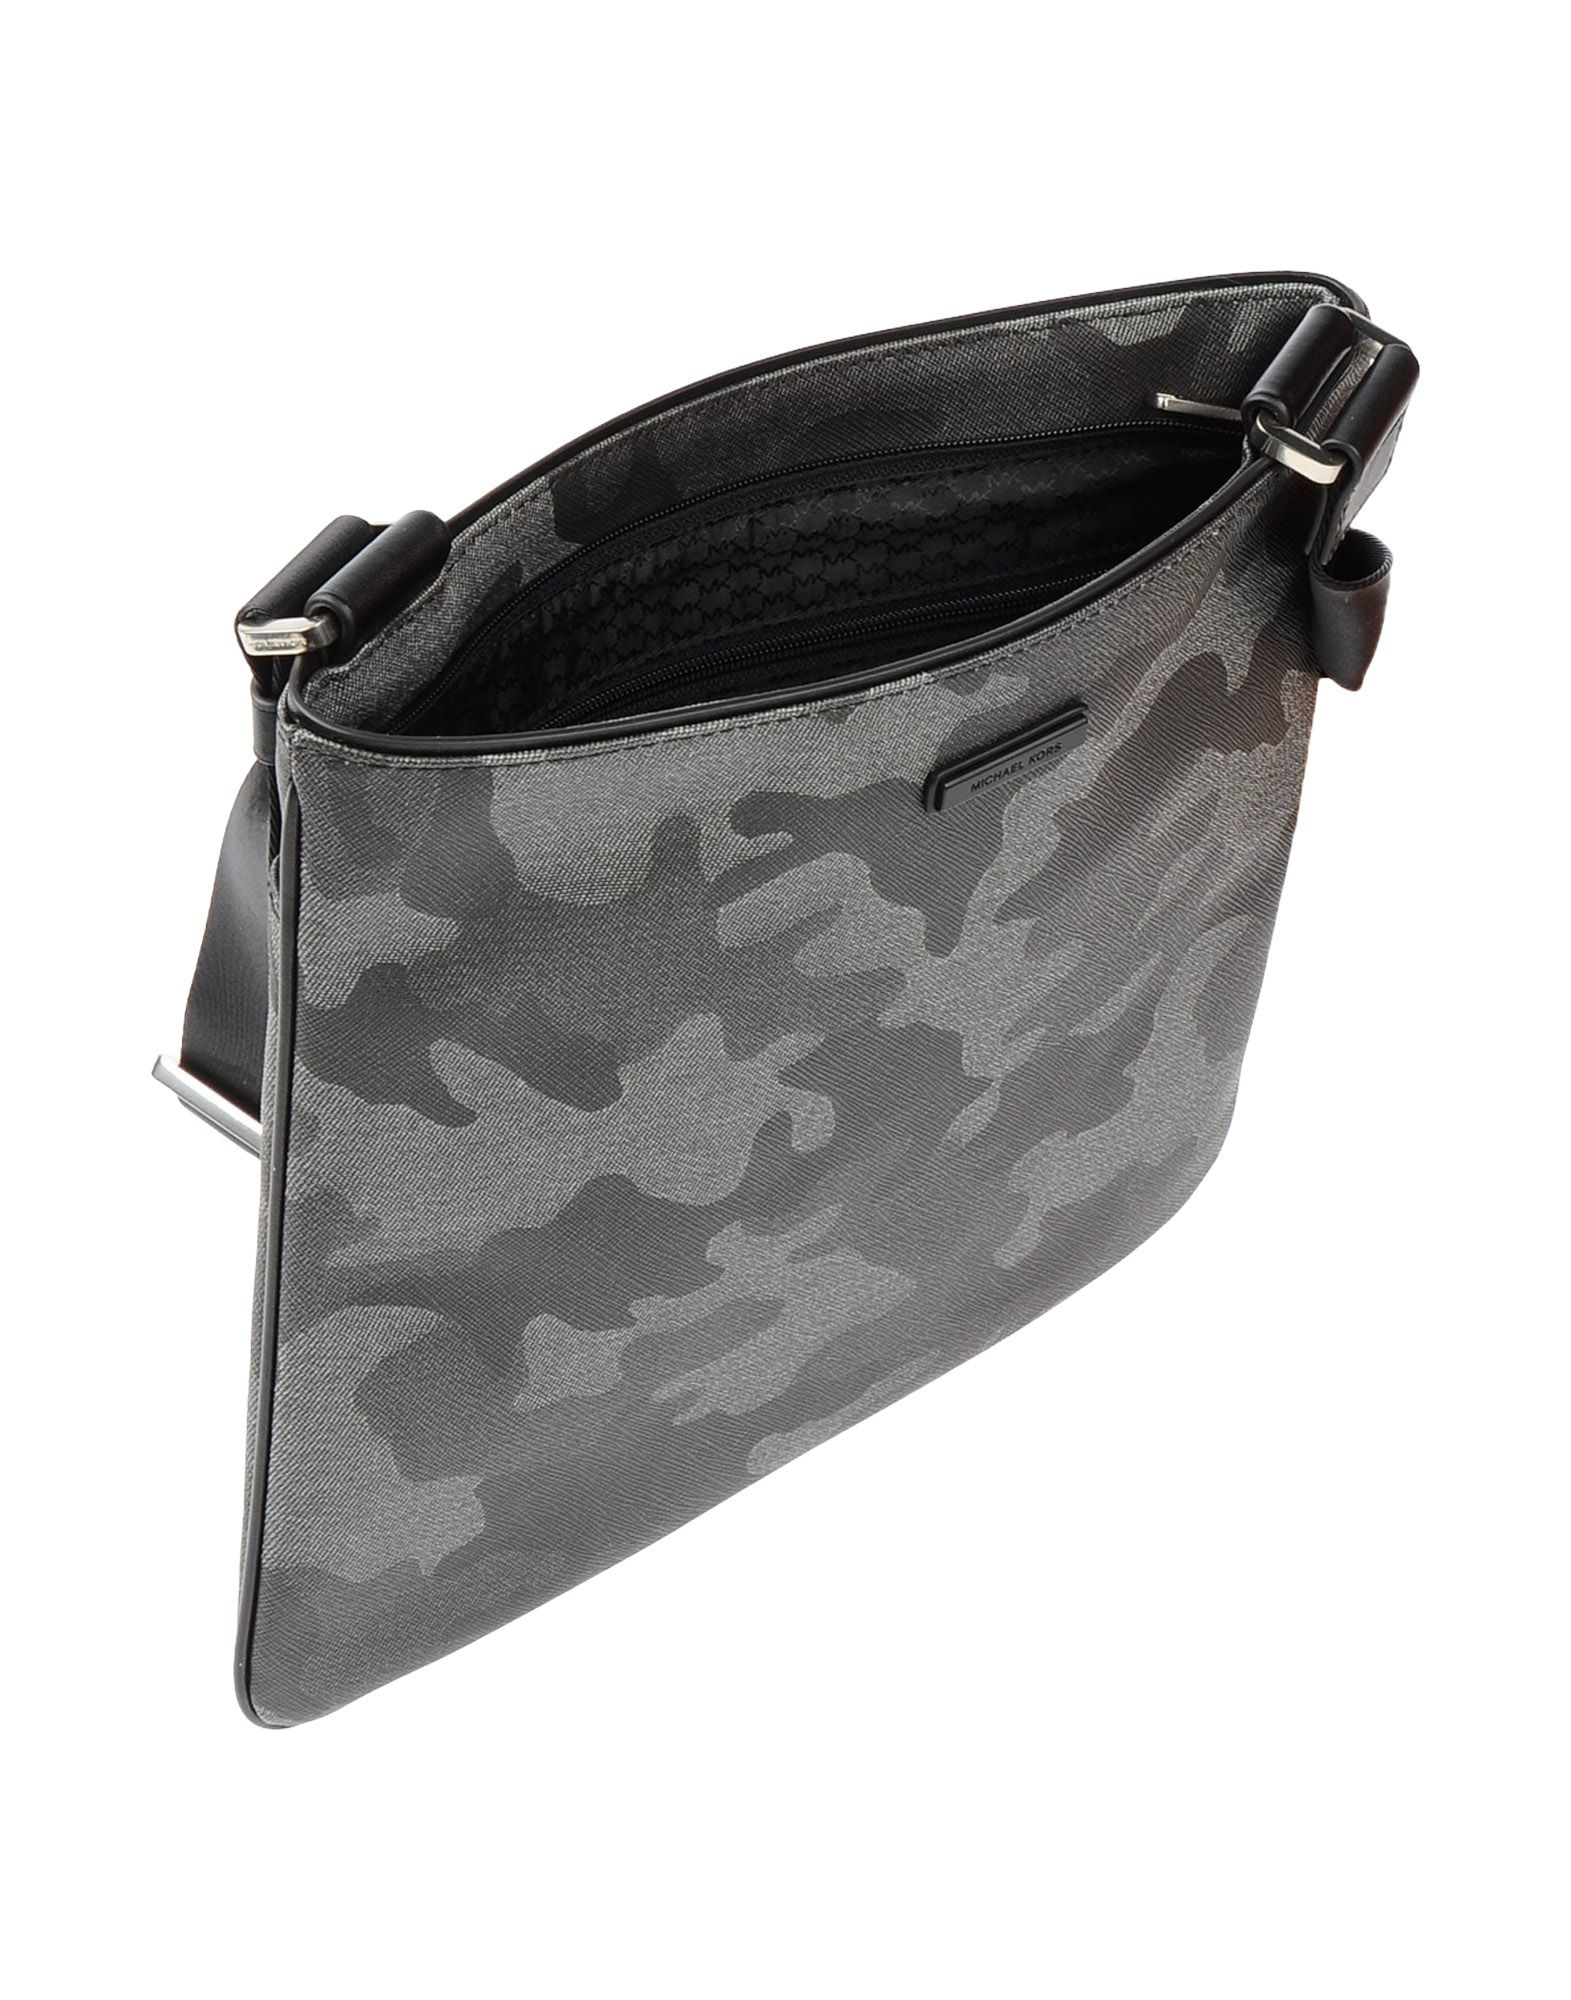 de8d859fc53c Michael Kors Cross-body Bag in Gray for Men - Lyst